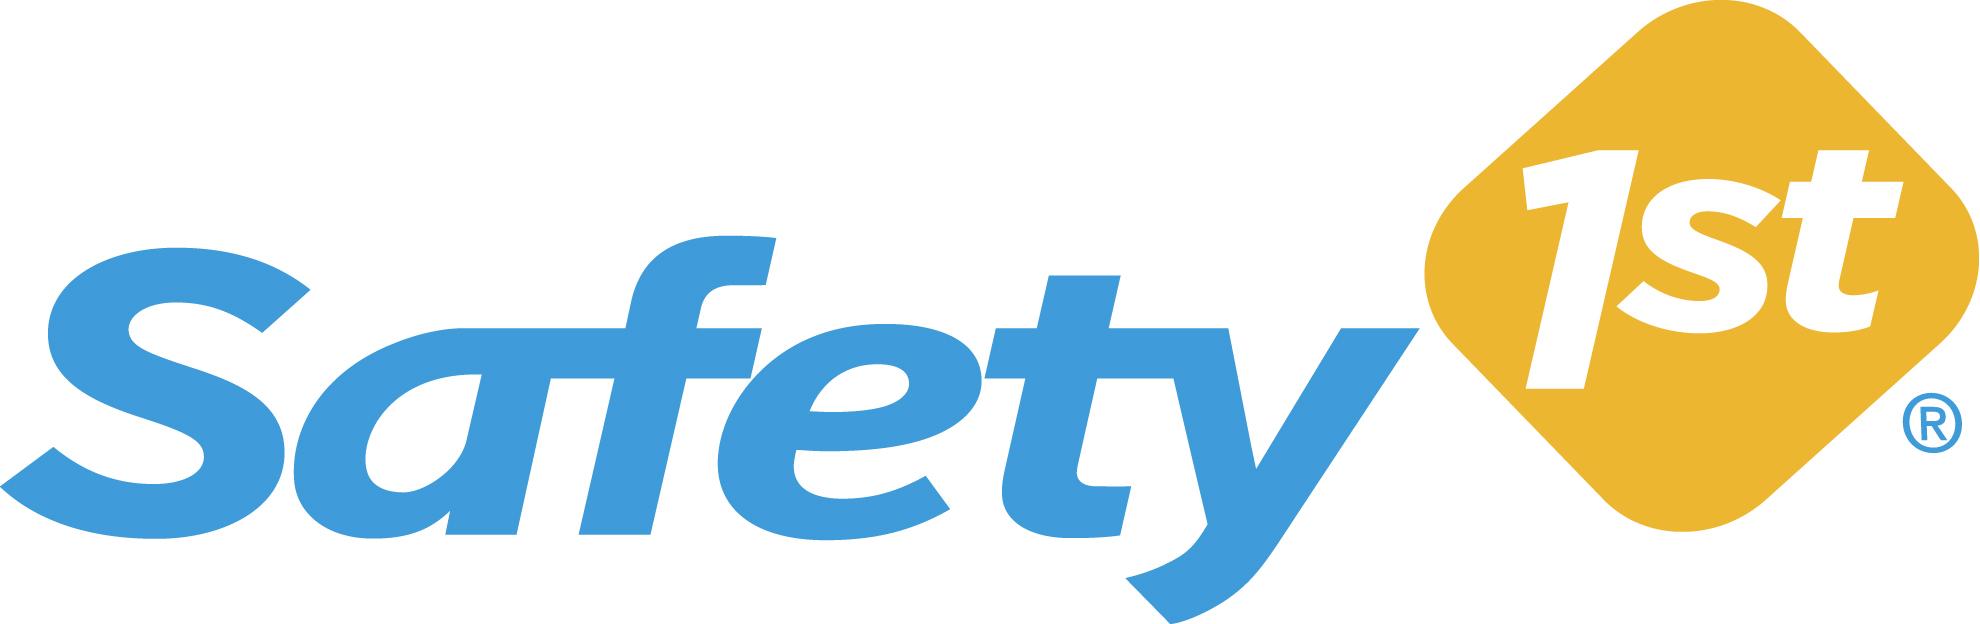 logo safety 1st